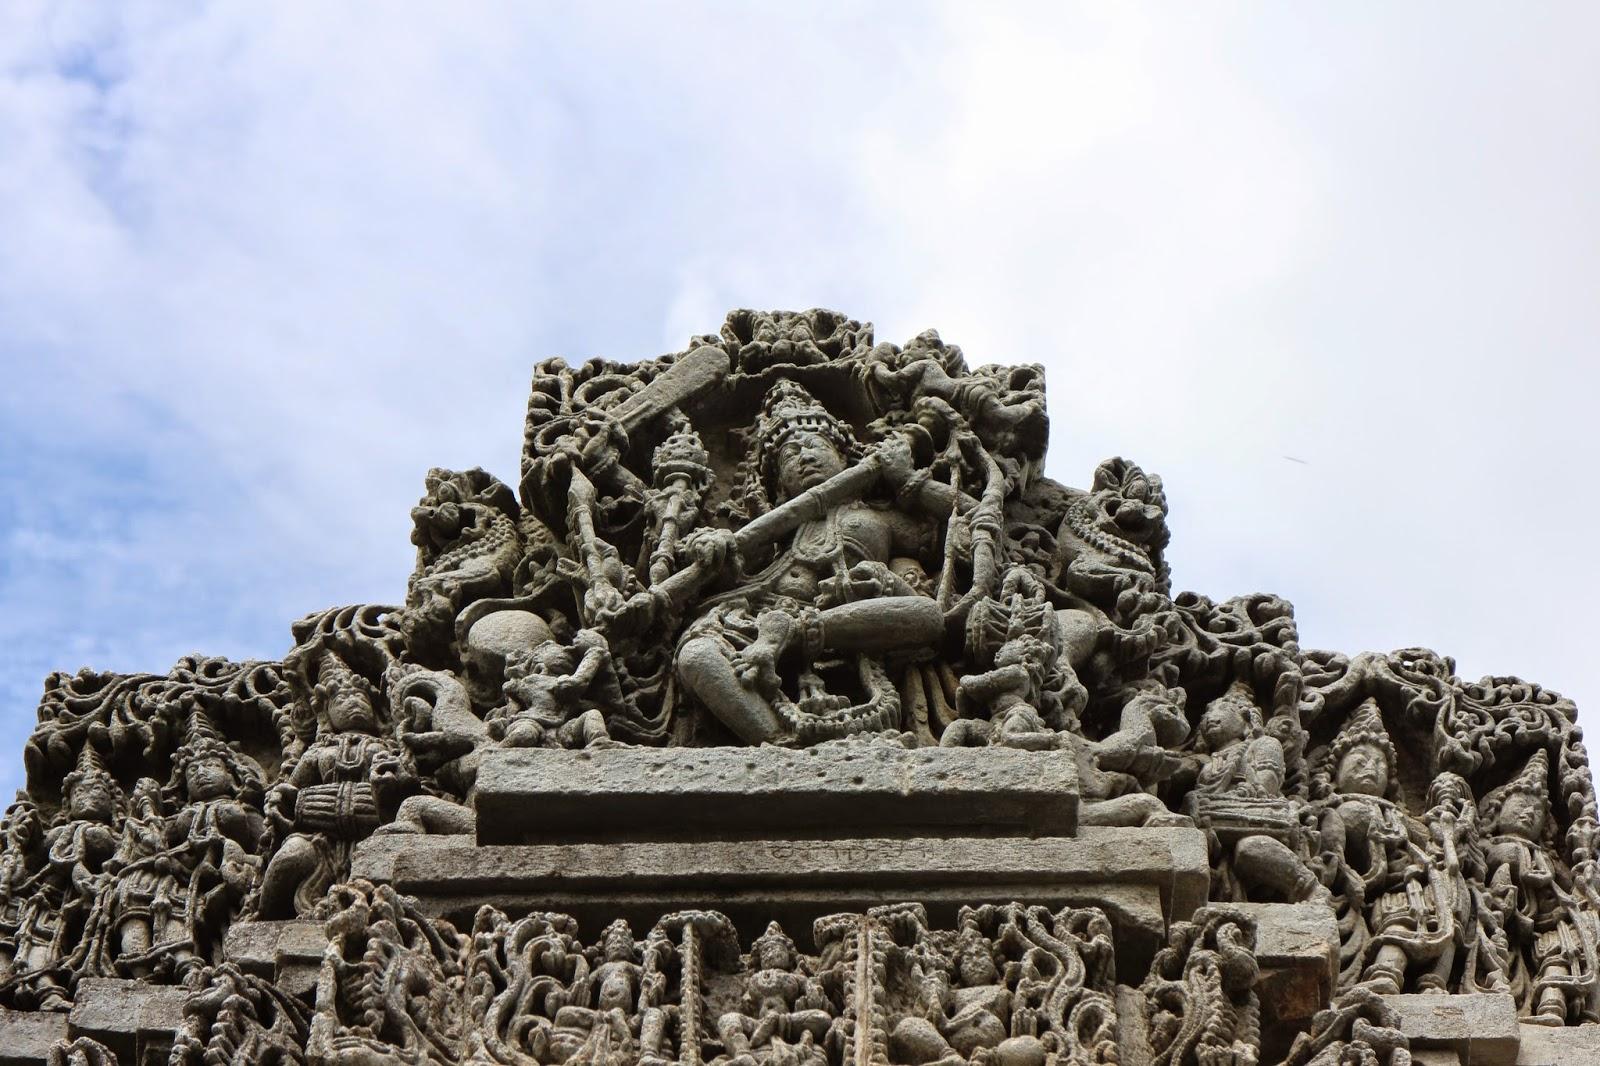 Hoysala Temple, Nageshwara Temple, Channakeshava temple, Mosale, Hassan, Heritage site, karnataka, Karnataka Tourism